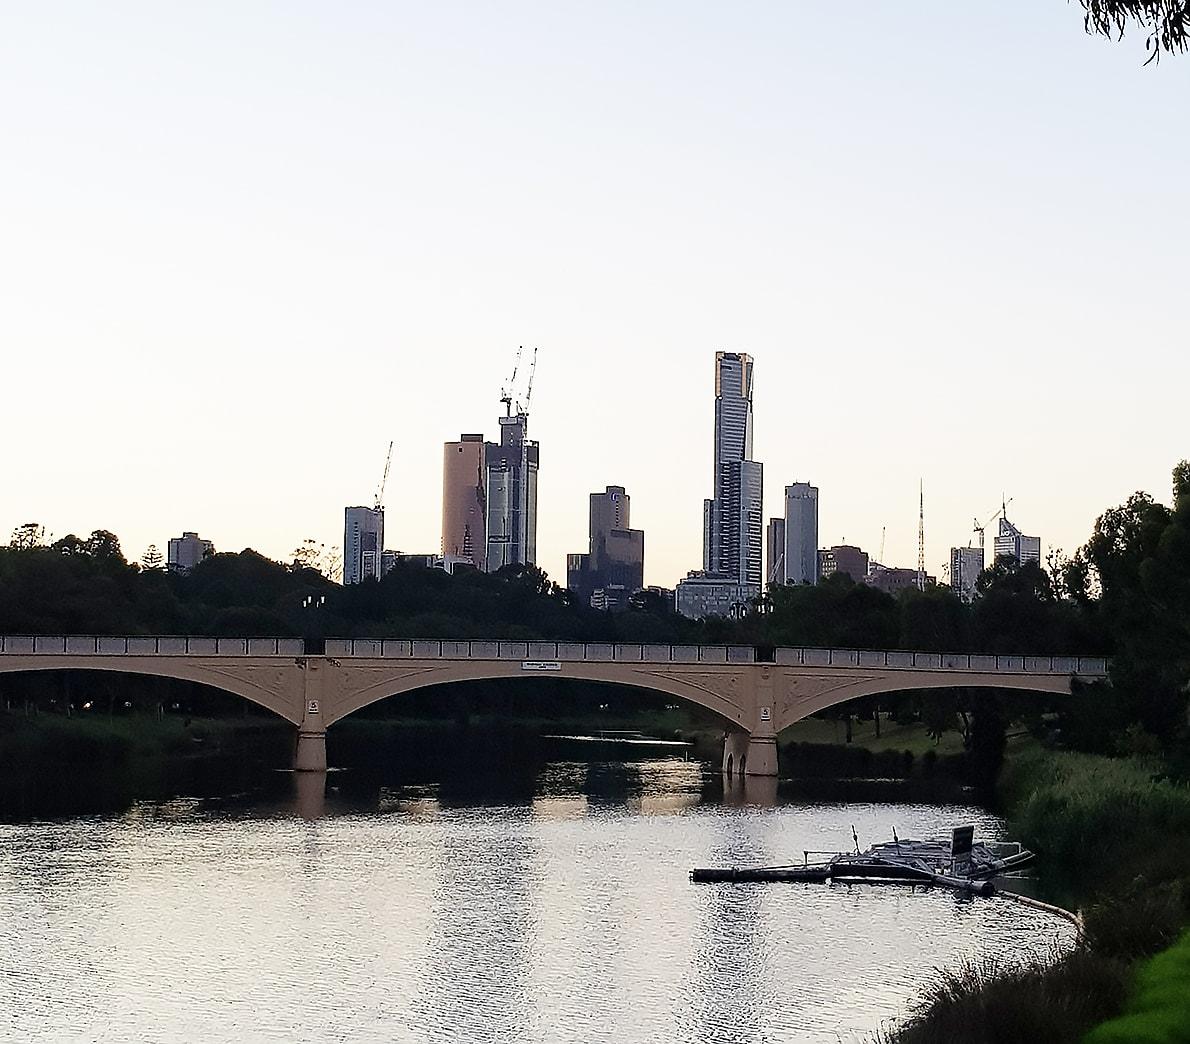 Australia 108 Construction Update - UPDATE 2020